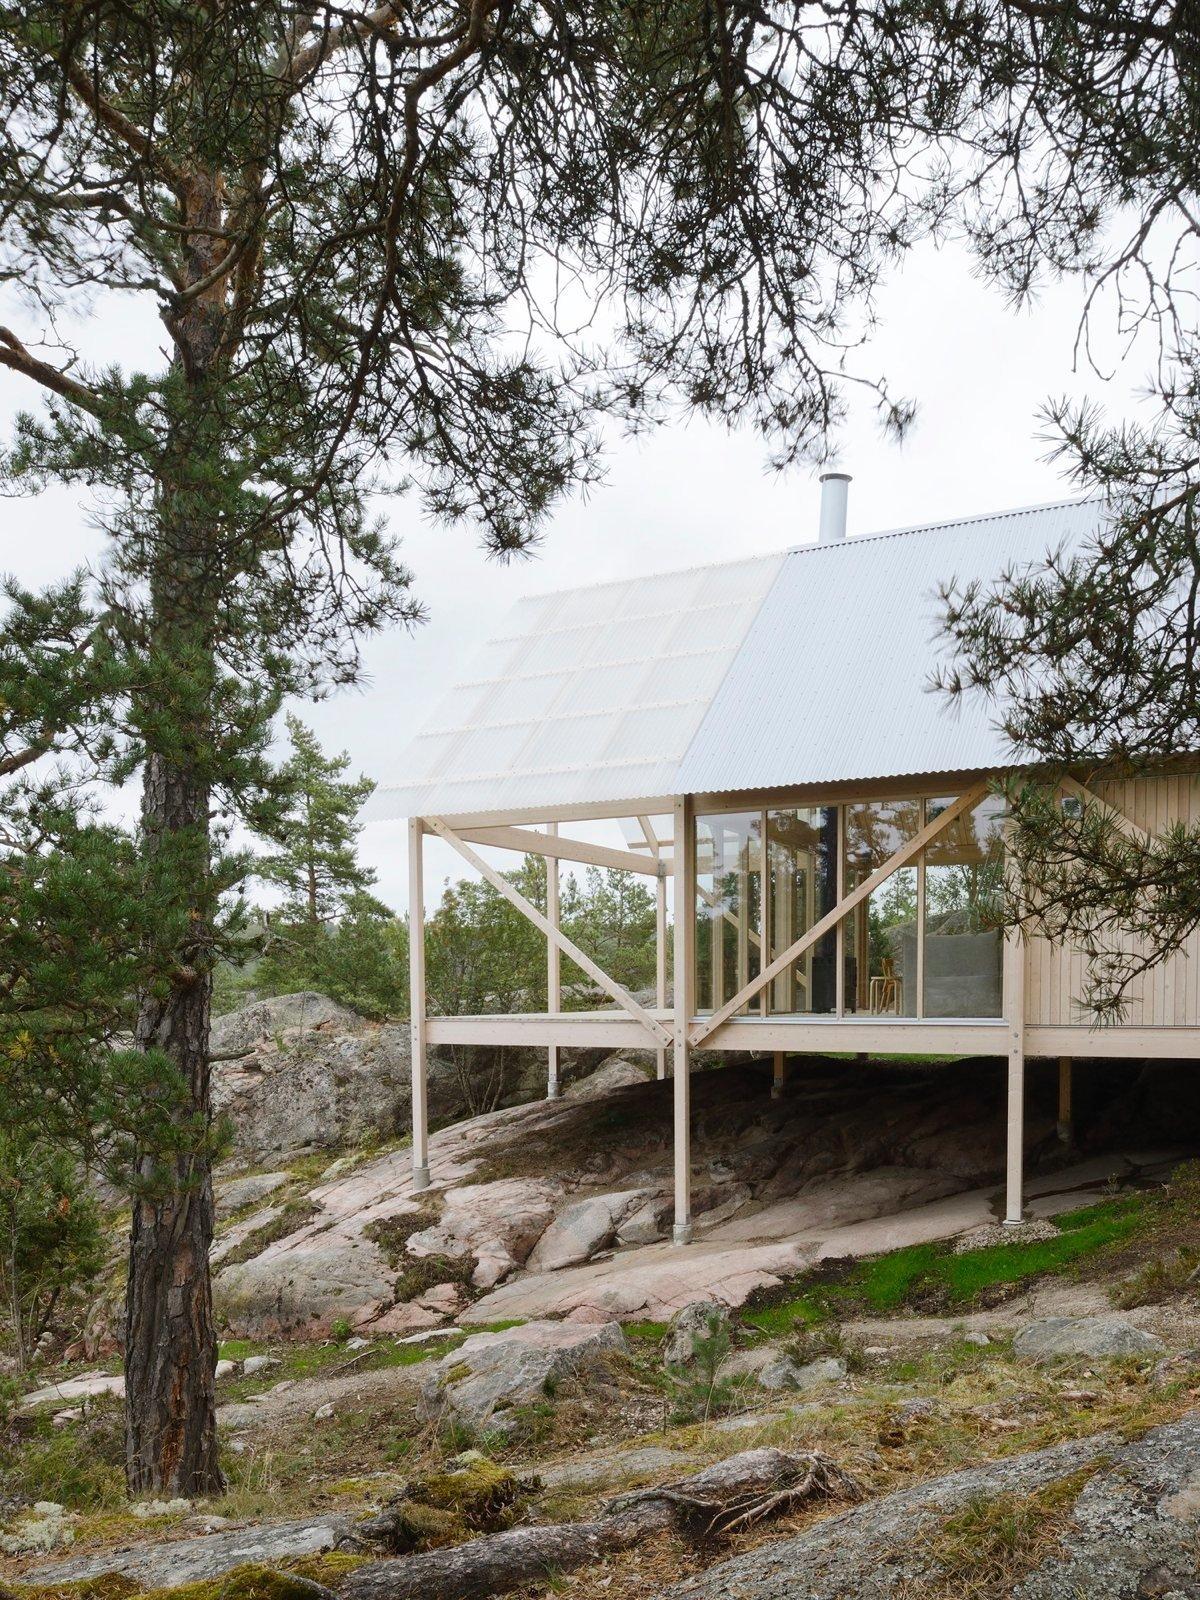 Exterior, House Building Type, and Wood Siding Material Viggsö by Arrhov Frick. © Mikael Olsson.  upinteriors.com/go/spr12  Best Photos